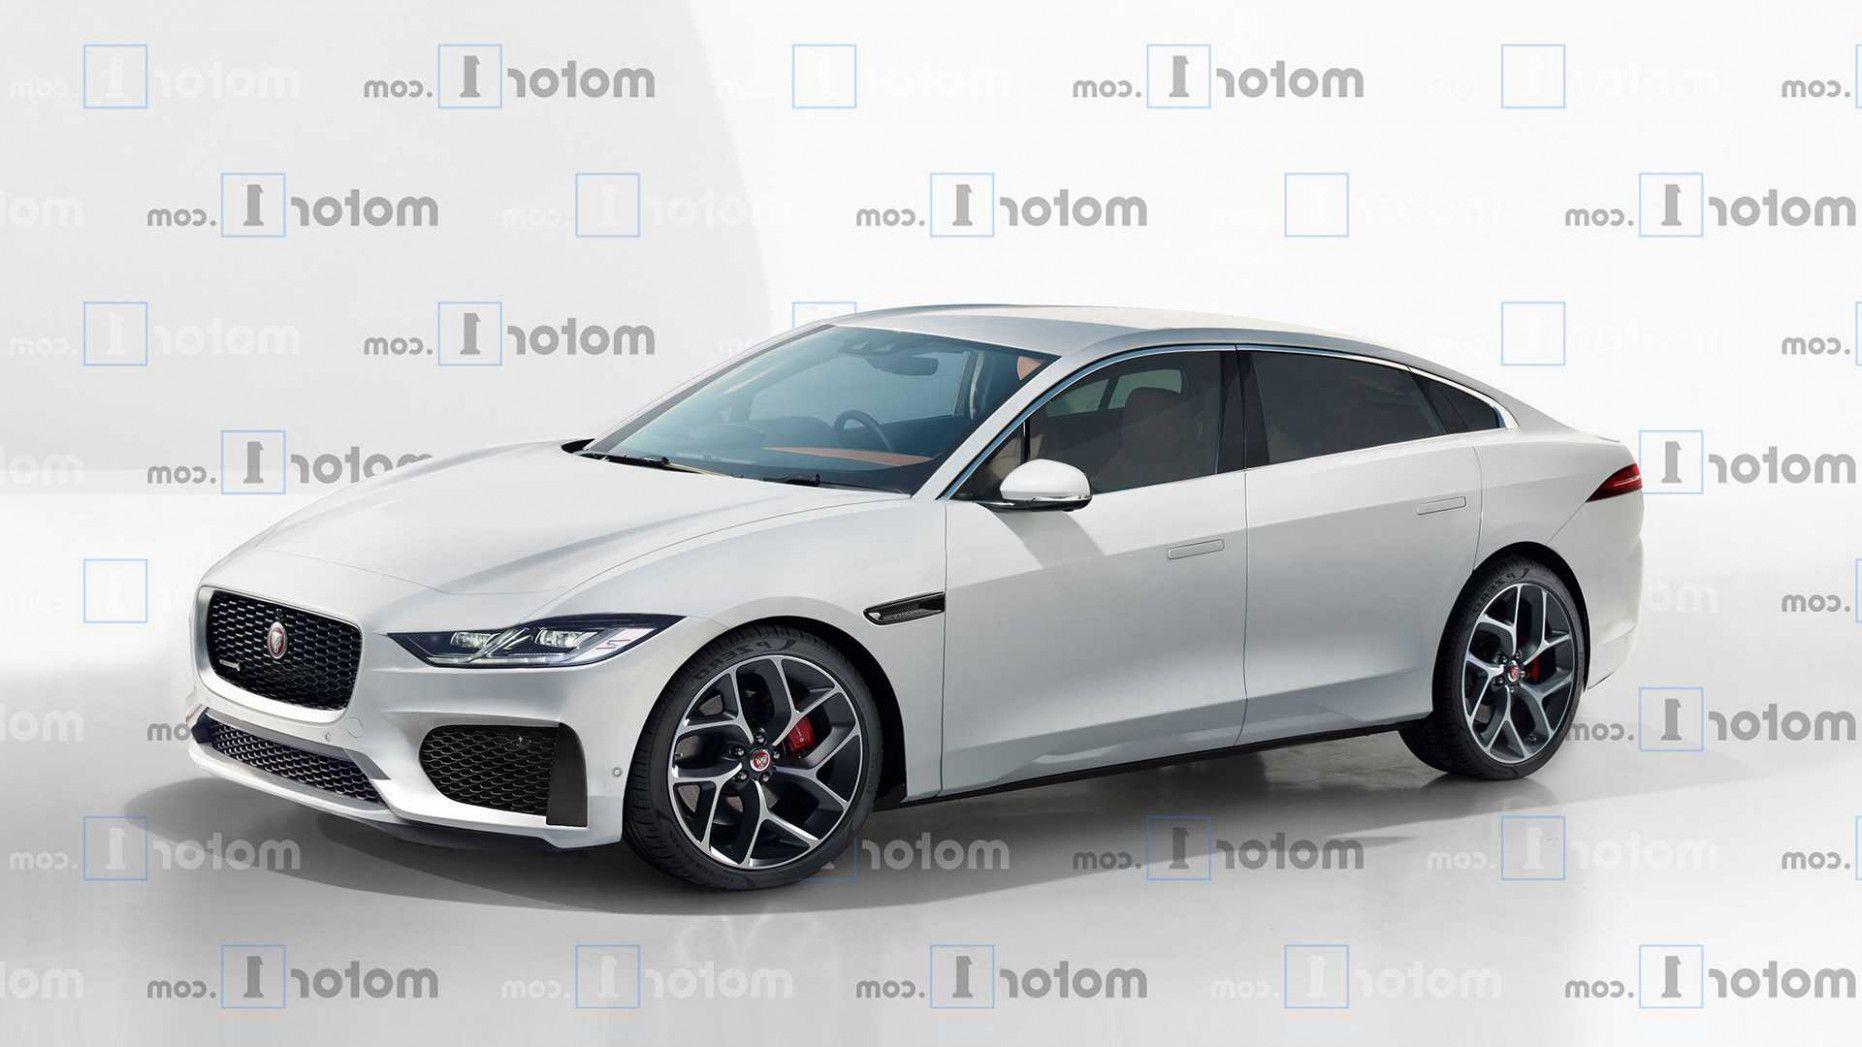 Learn The Truth About 2020 Jaguar Xj Used In The Next 60 Seconds Jaguar Xj New Jaguar Jaguar Xe